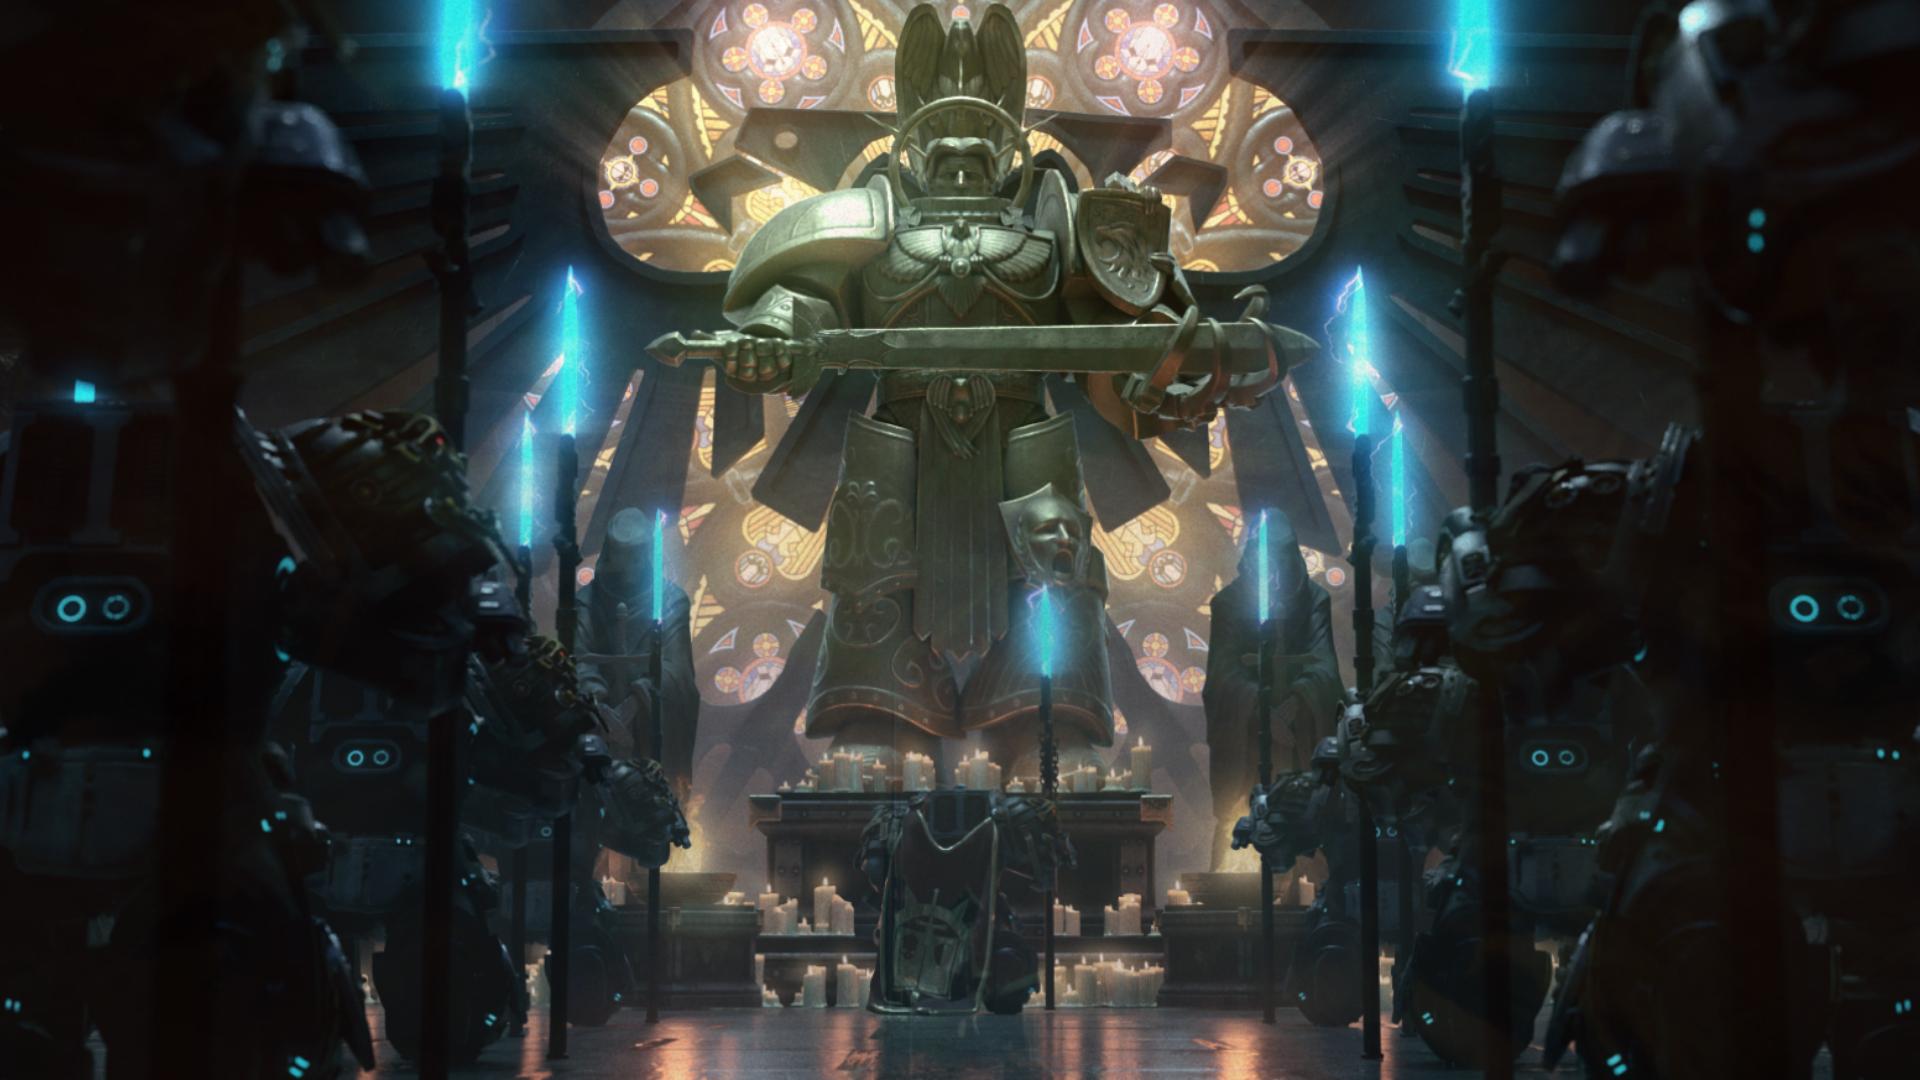 Warhammer 40k: Chaos Gate – Daemonhunters a Space Marine XCOM